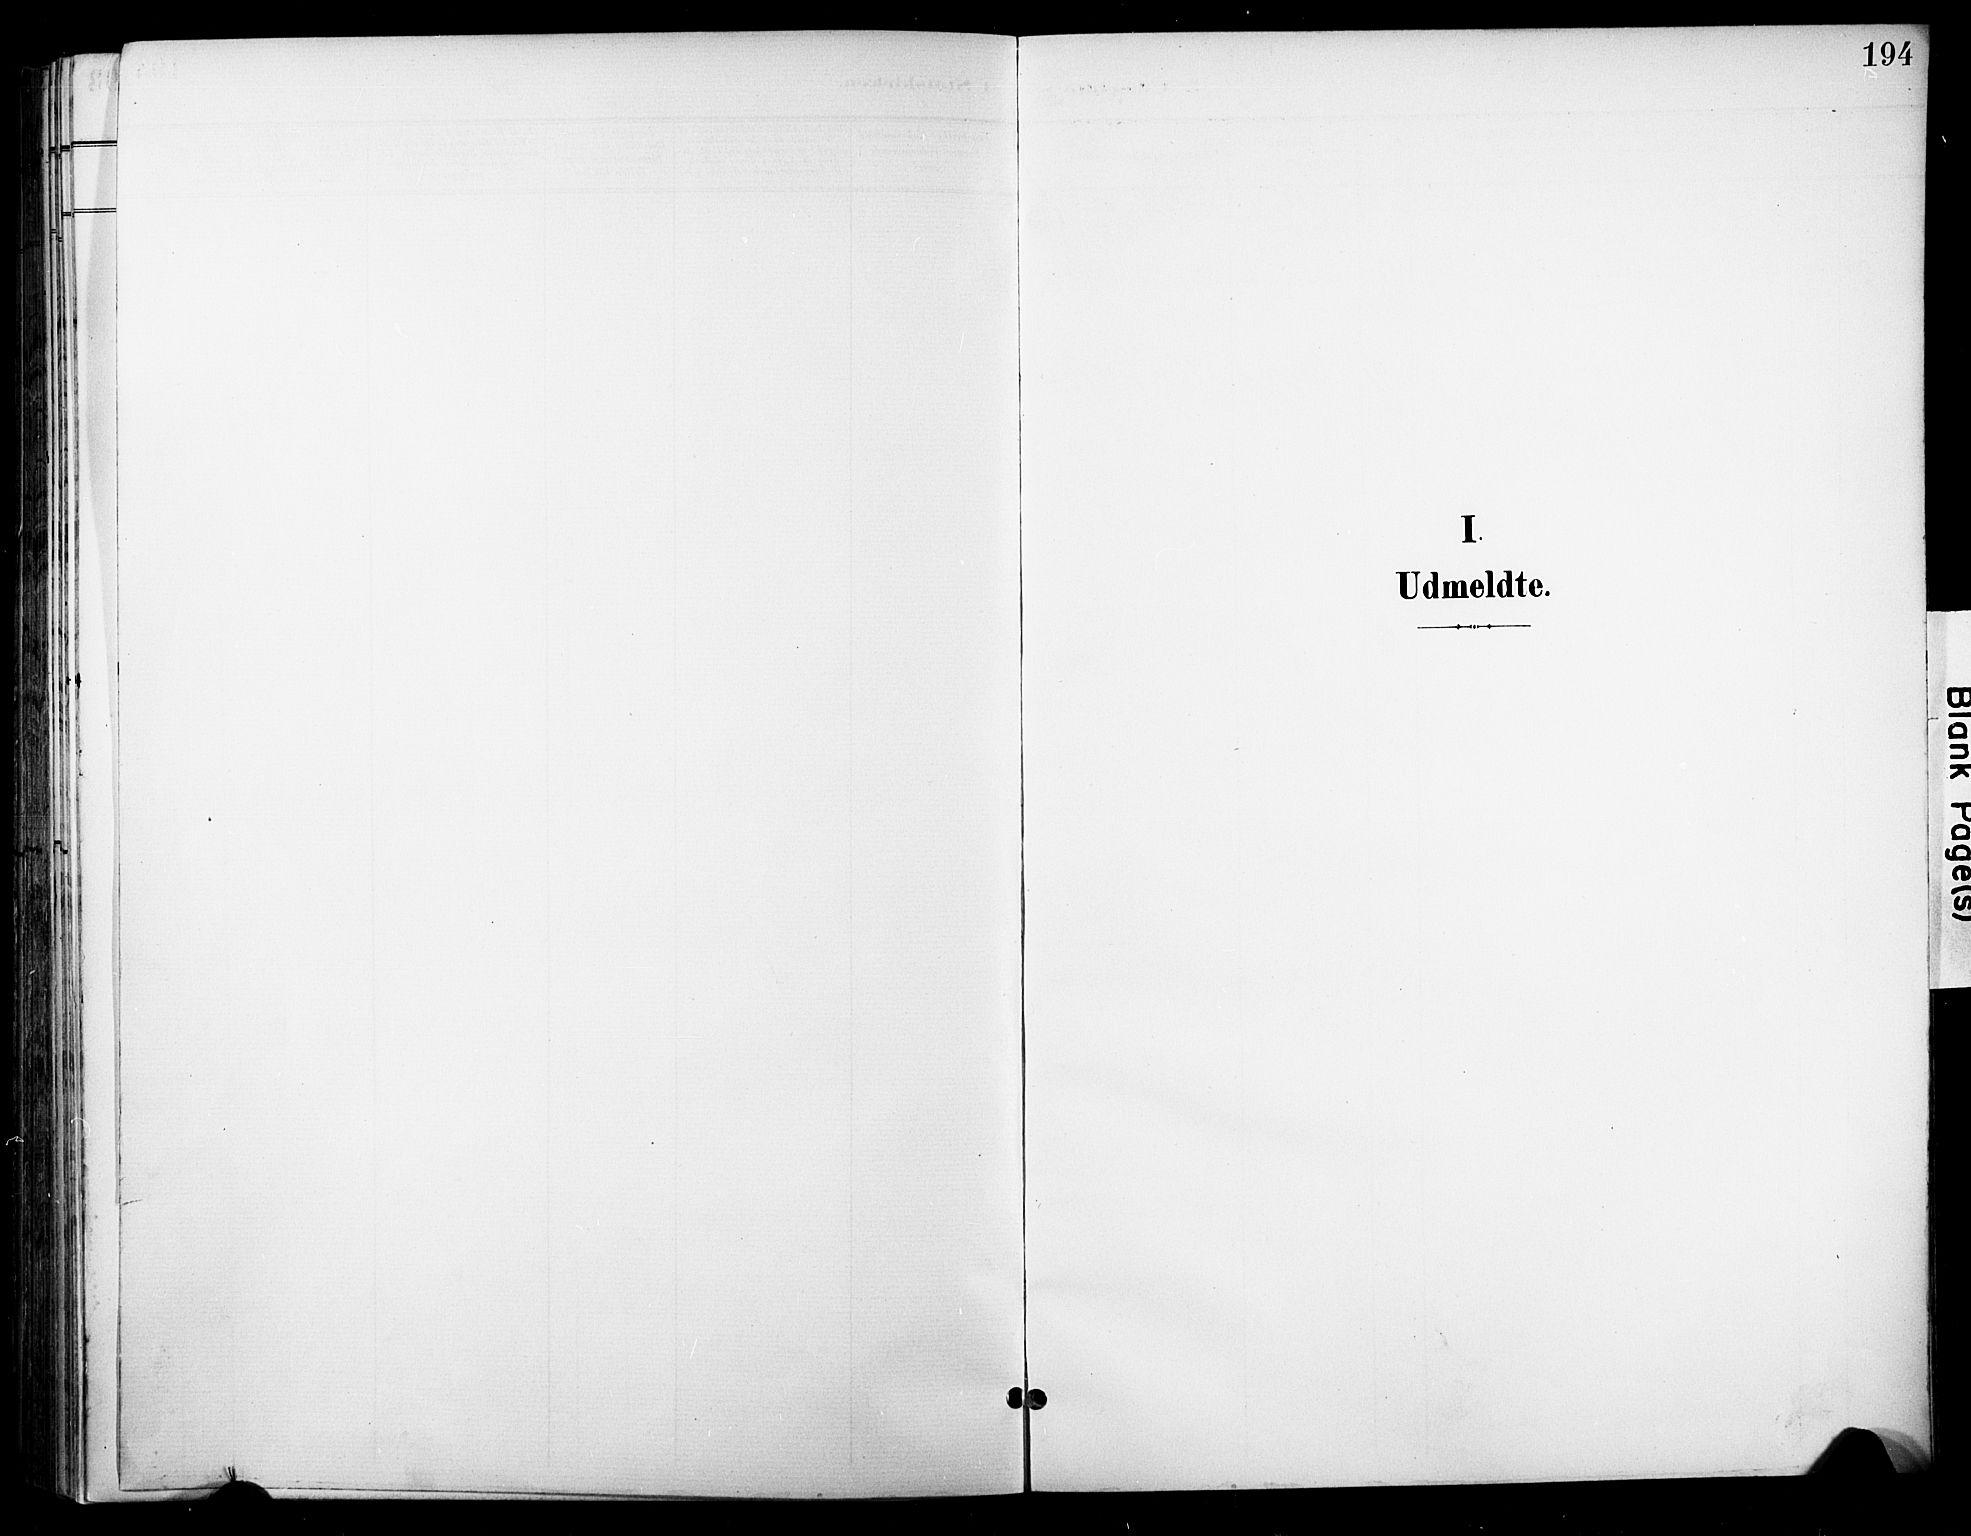 SAKO, Nore kirkebøker, F/Fc/L0005: Ministerialbok nr. III 5, 1898-1922, s. 194